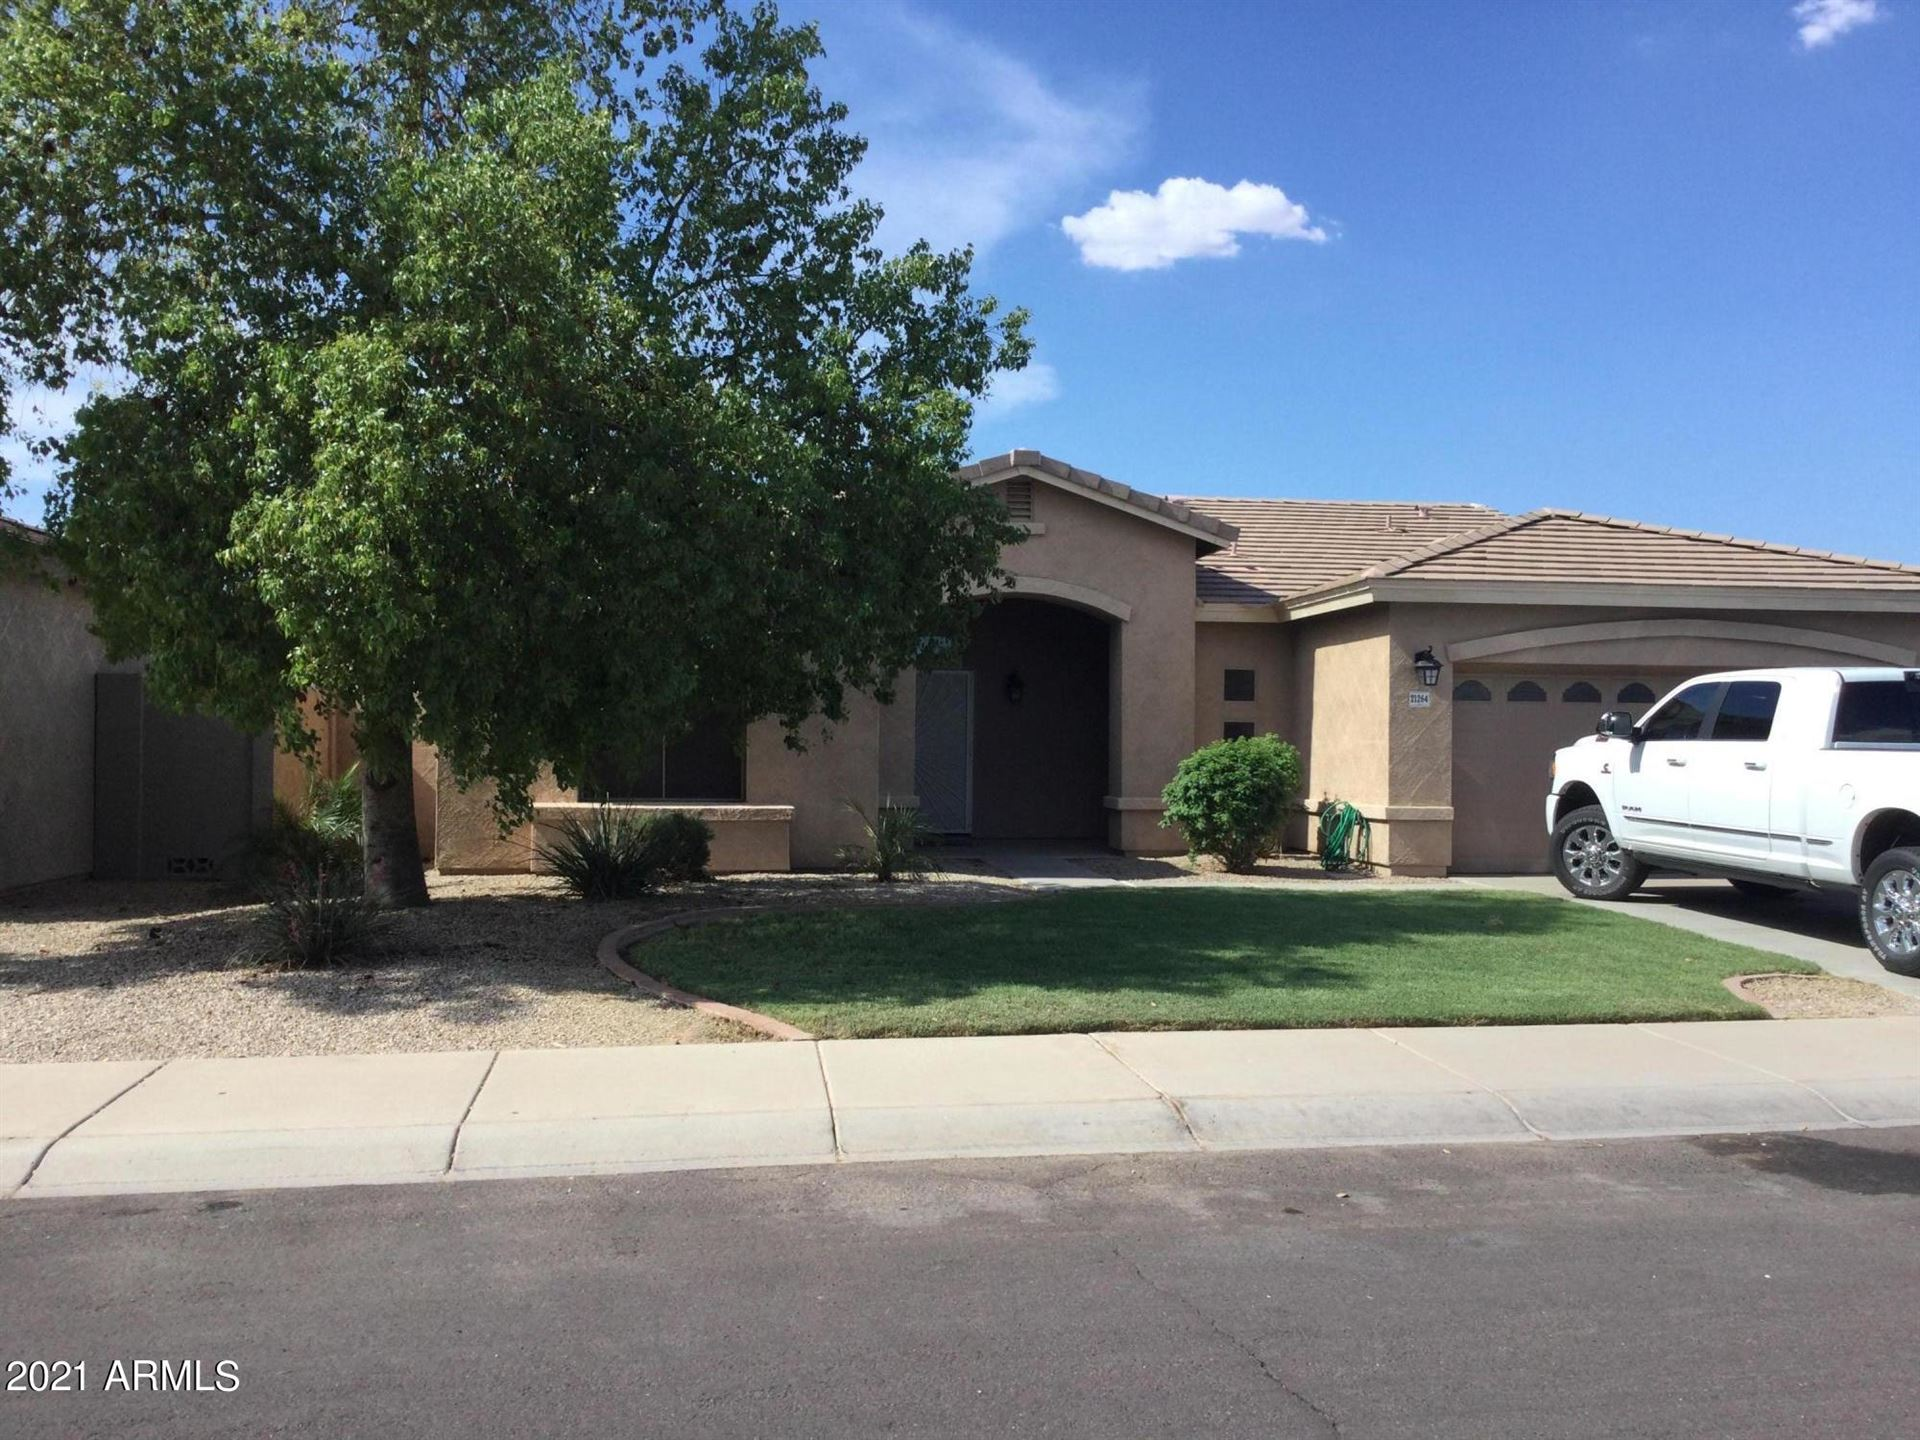 Photo of 21264 E BONANZA Way, Queen Creek, AZ 85142 (MLS # 6268388)